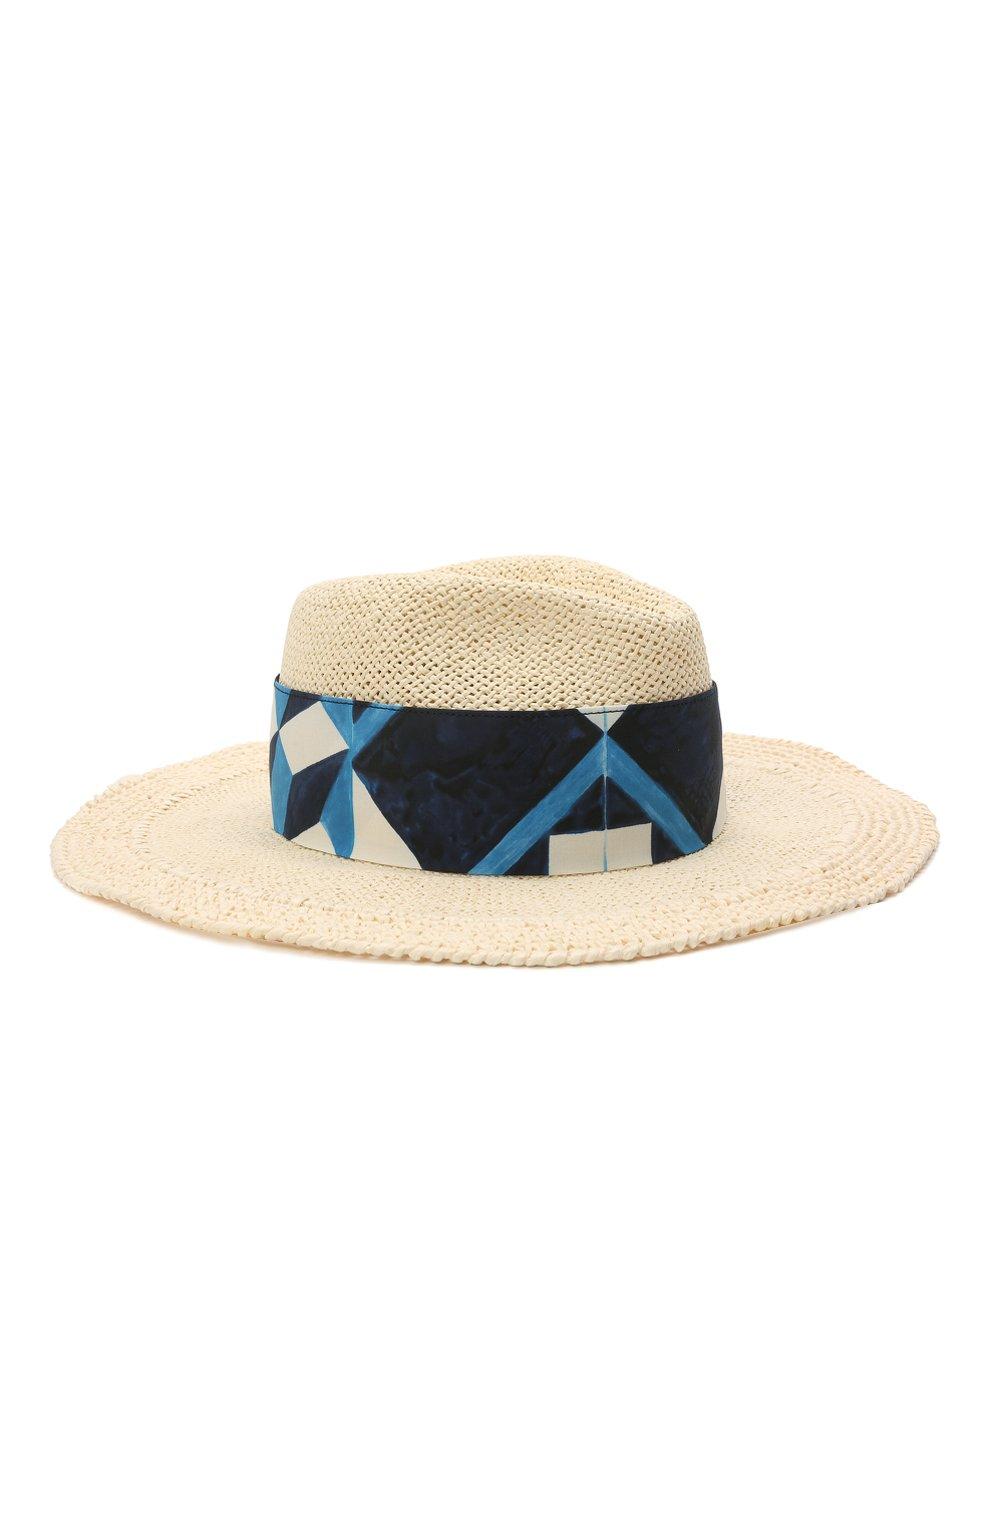 Мужская шляпа DOLCE & GABBANA бежевого цвета, арт. GH694Z/G3UAP | Фото 2